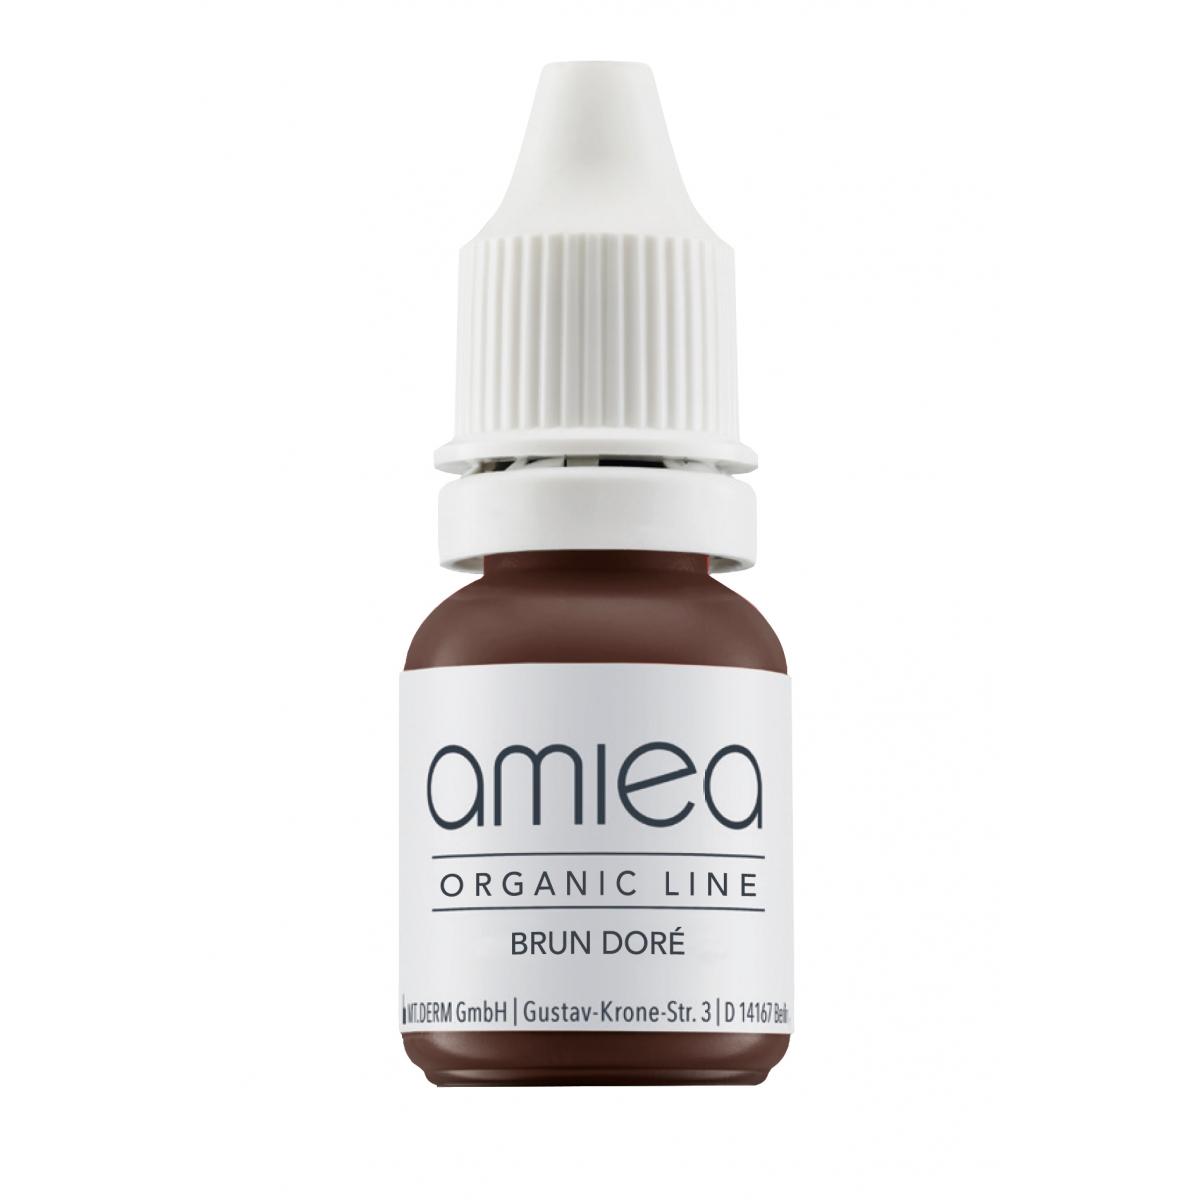 Organicline (10 ml) - PIGMENTS AMIEA ORGANICLINE BRUN DORE, Flacon 10 ml